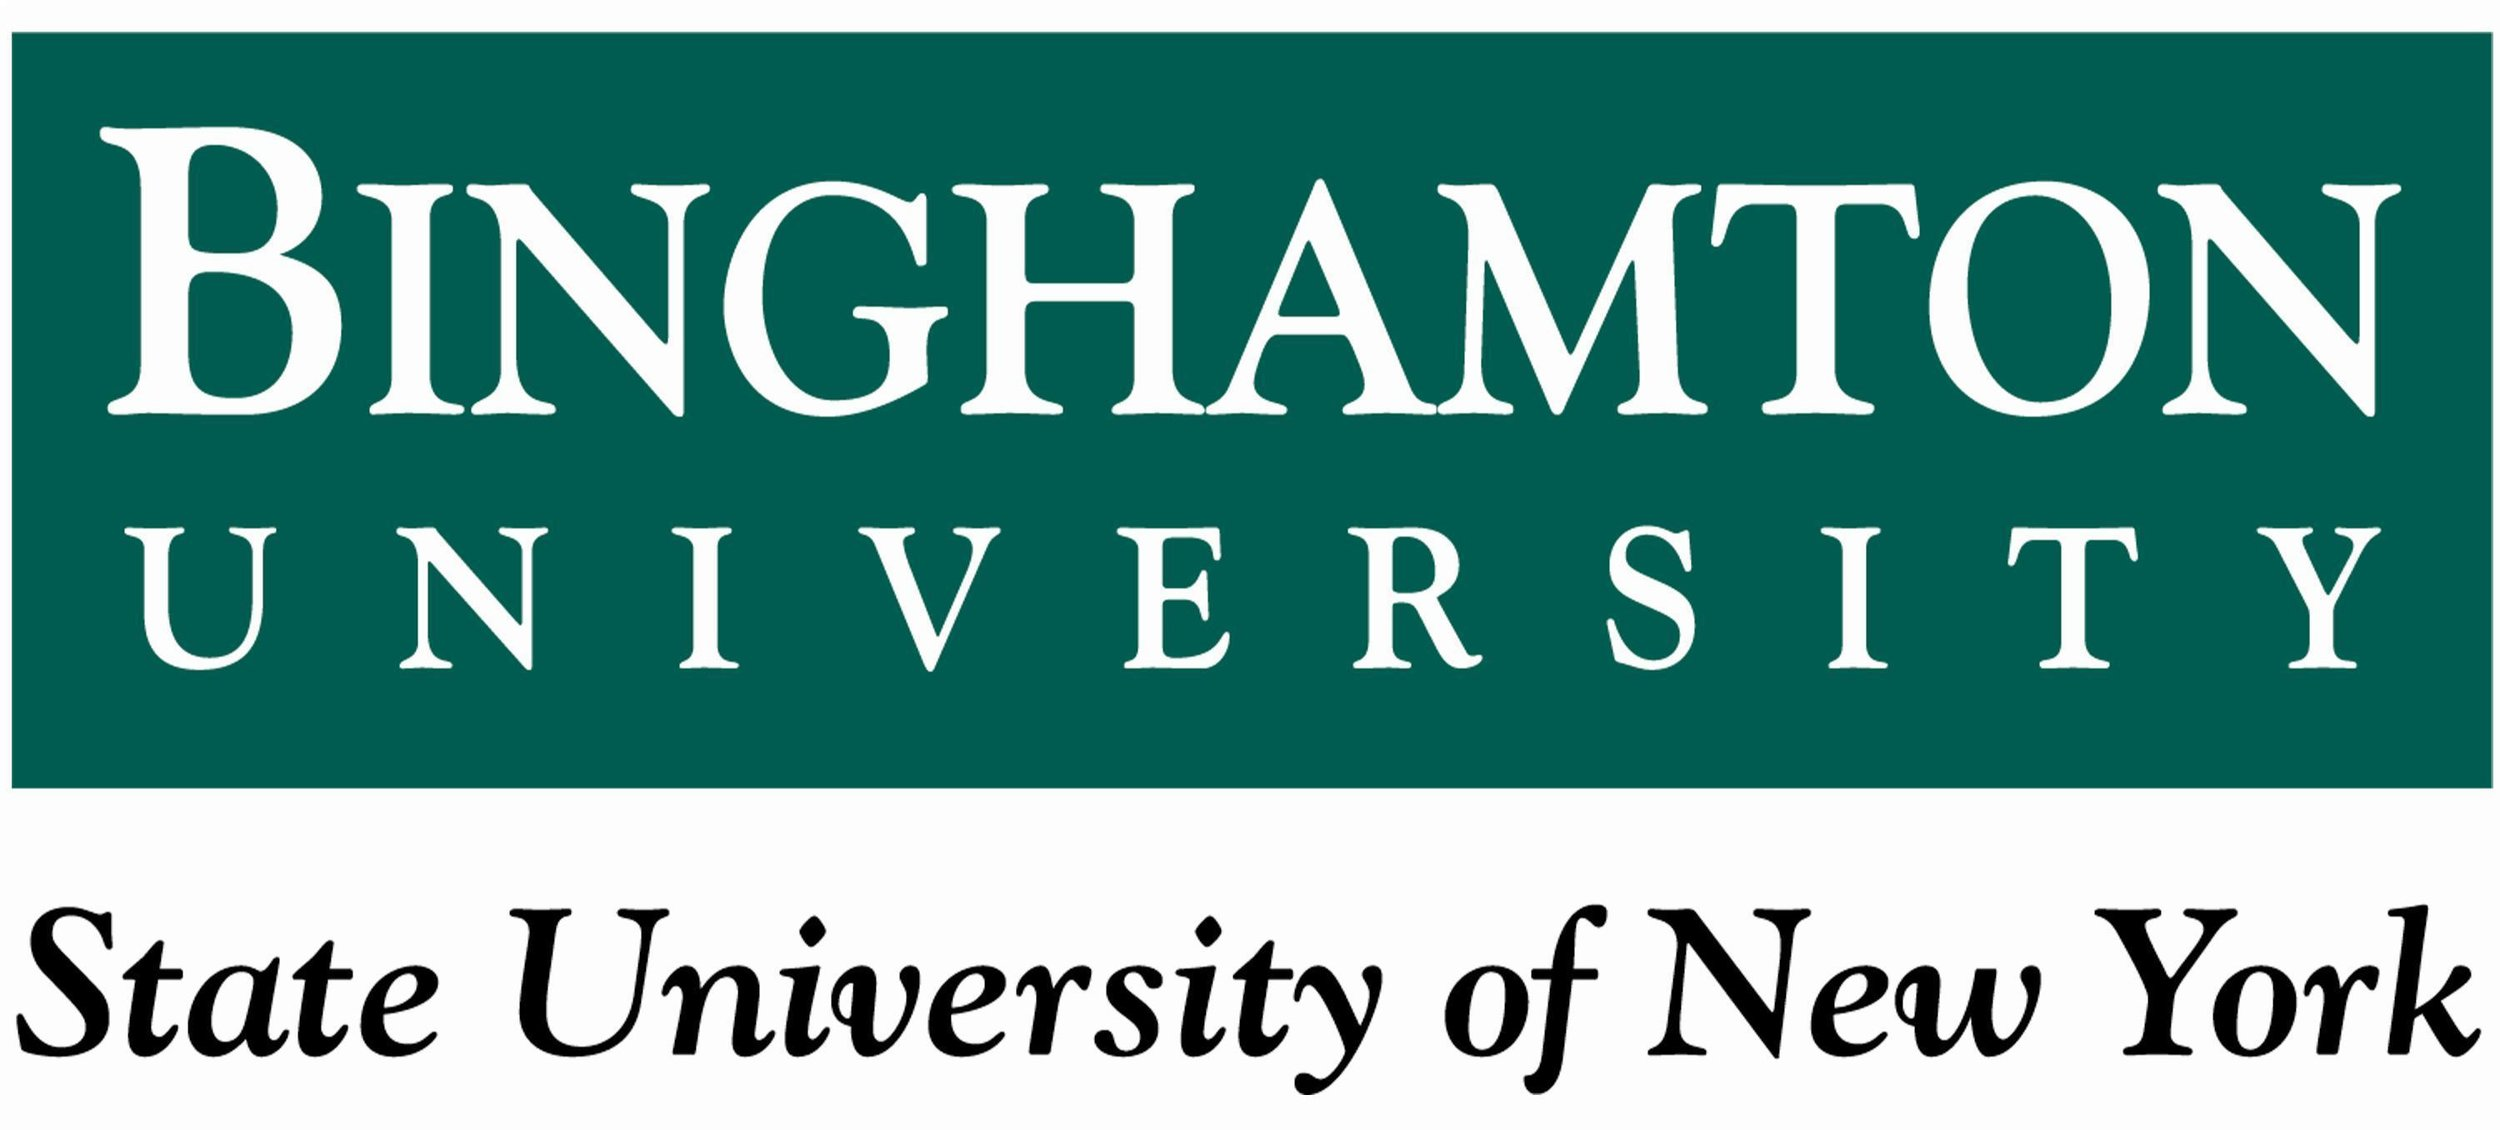 Binghamton_University_State_University_of_New_York_logo_(7).jpg